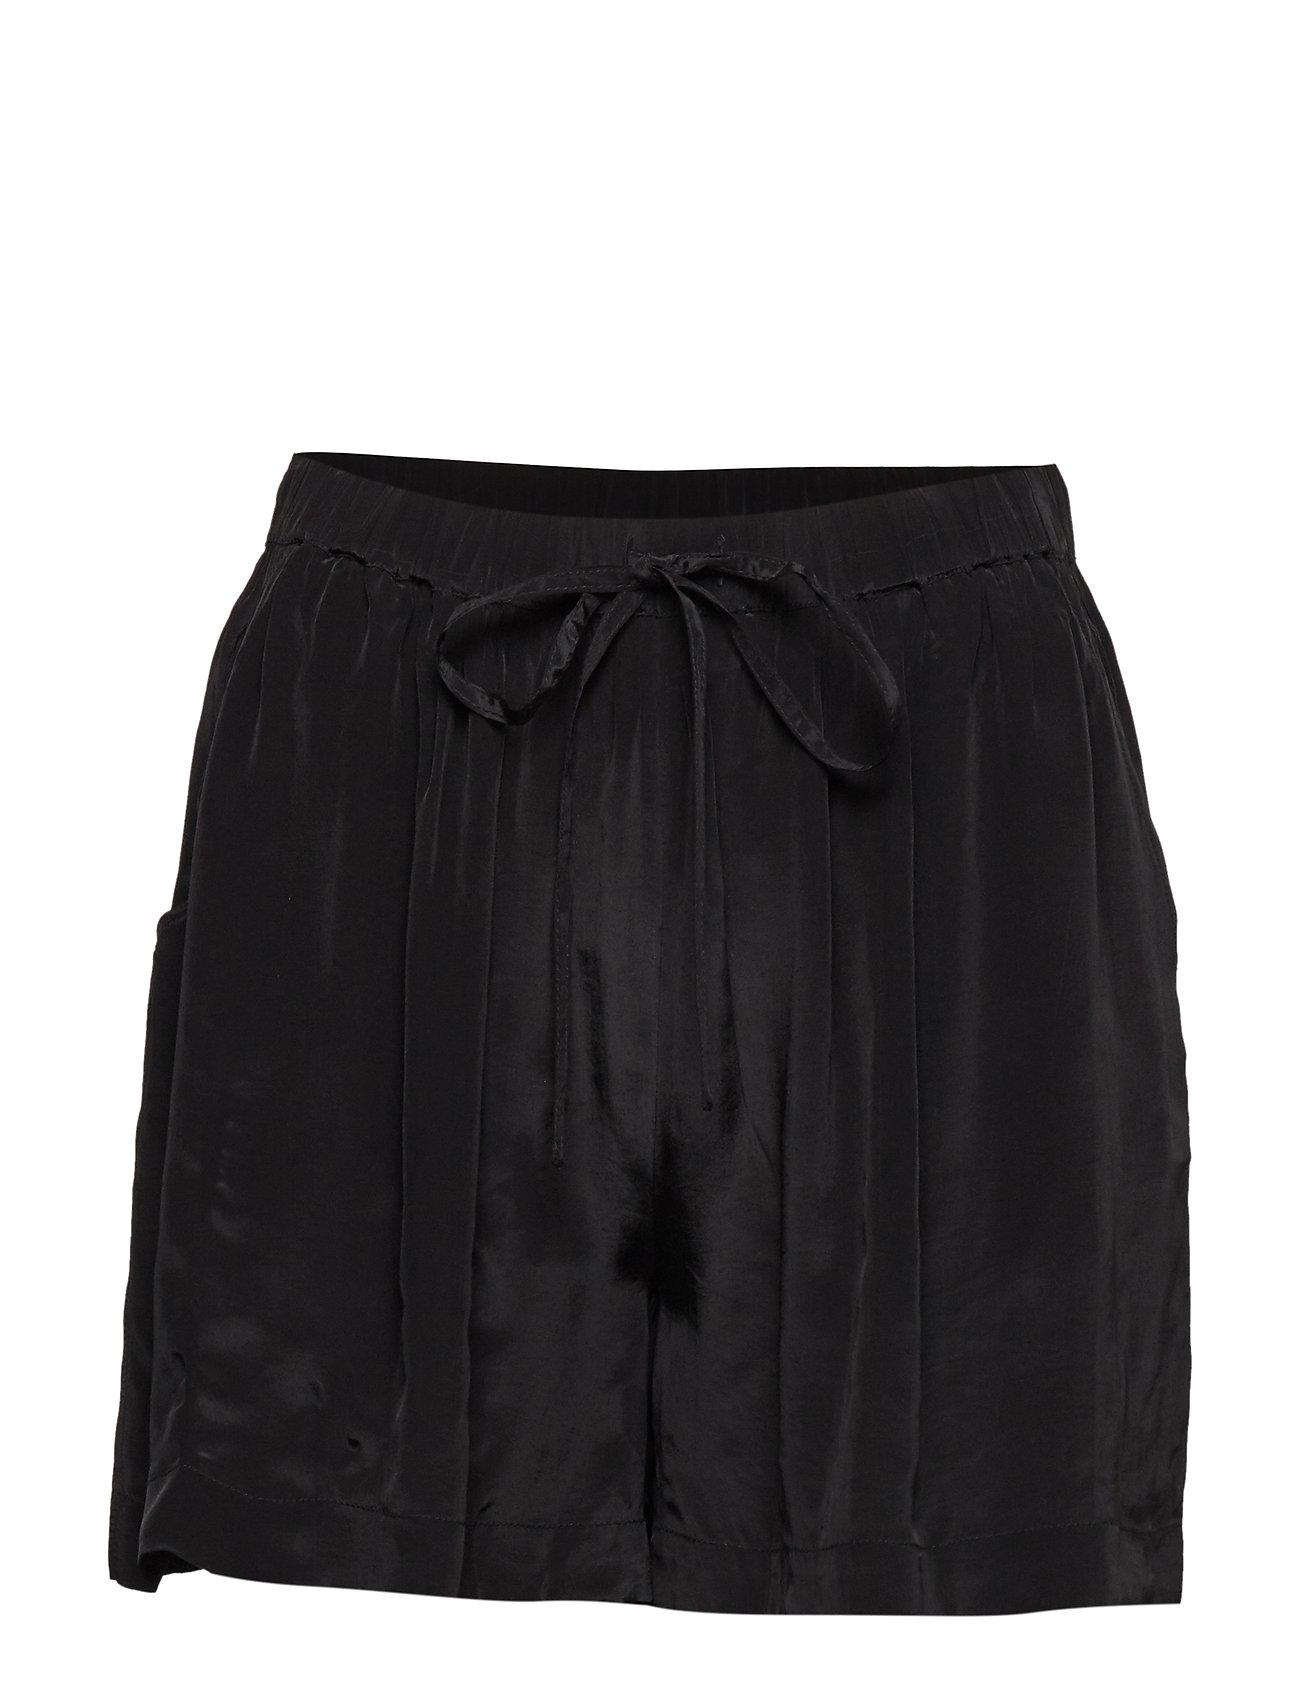 Lovechild 1979 Antonella Shorts - BLACK